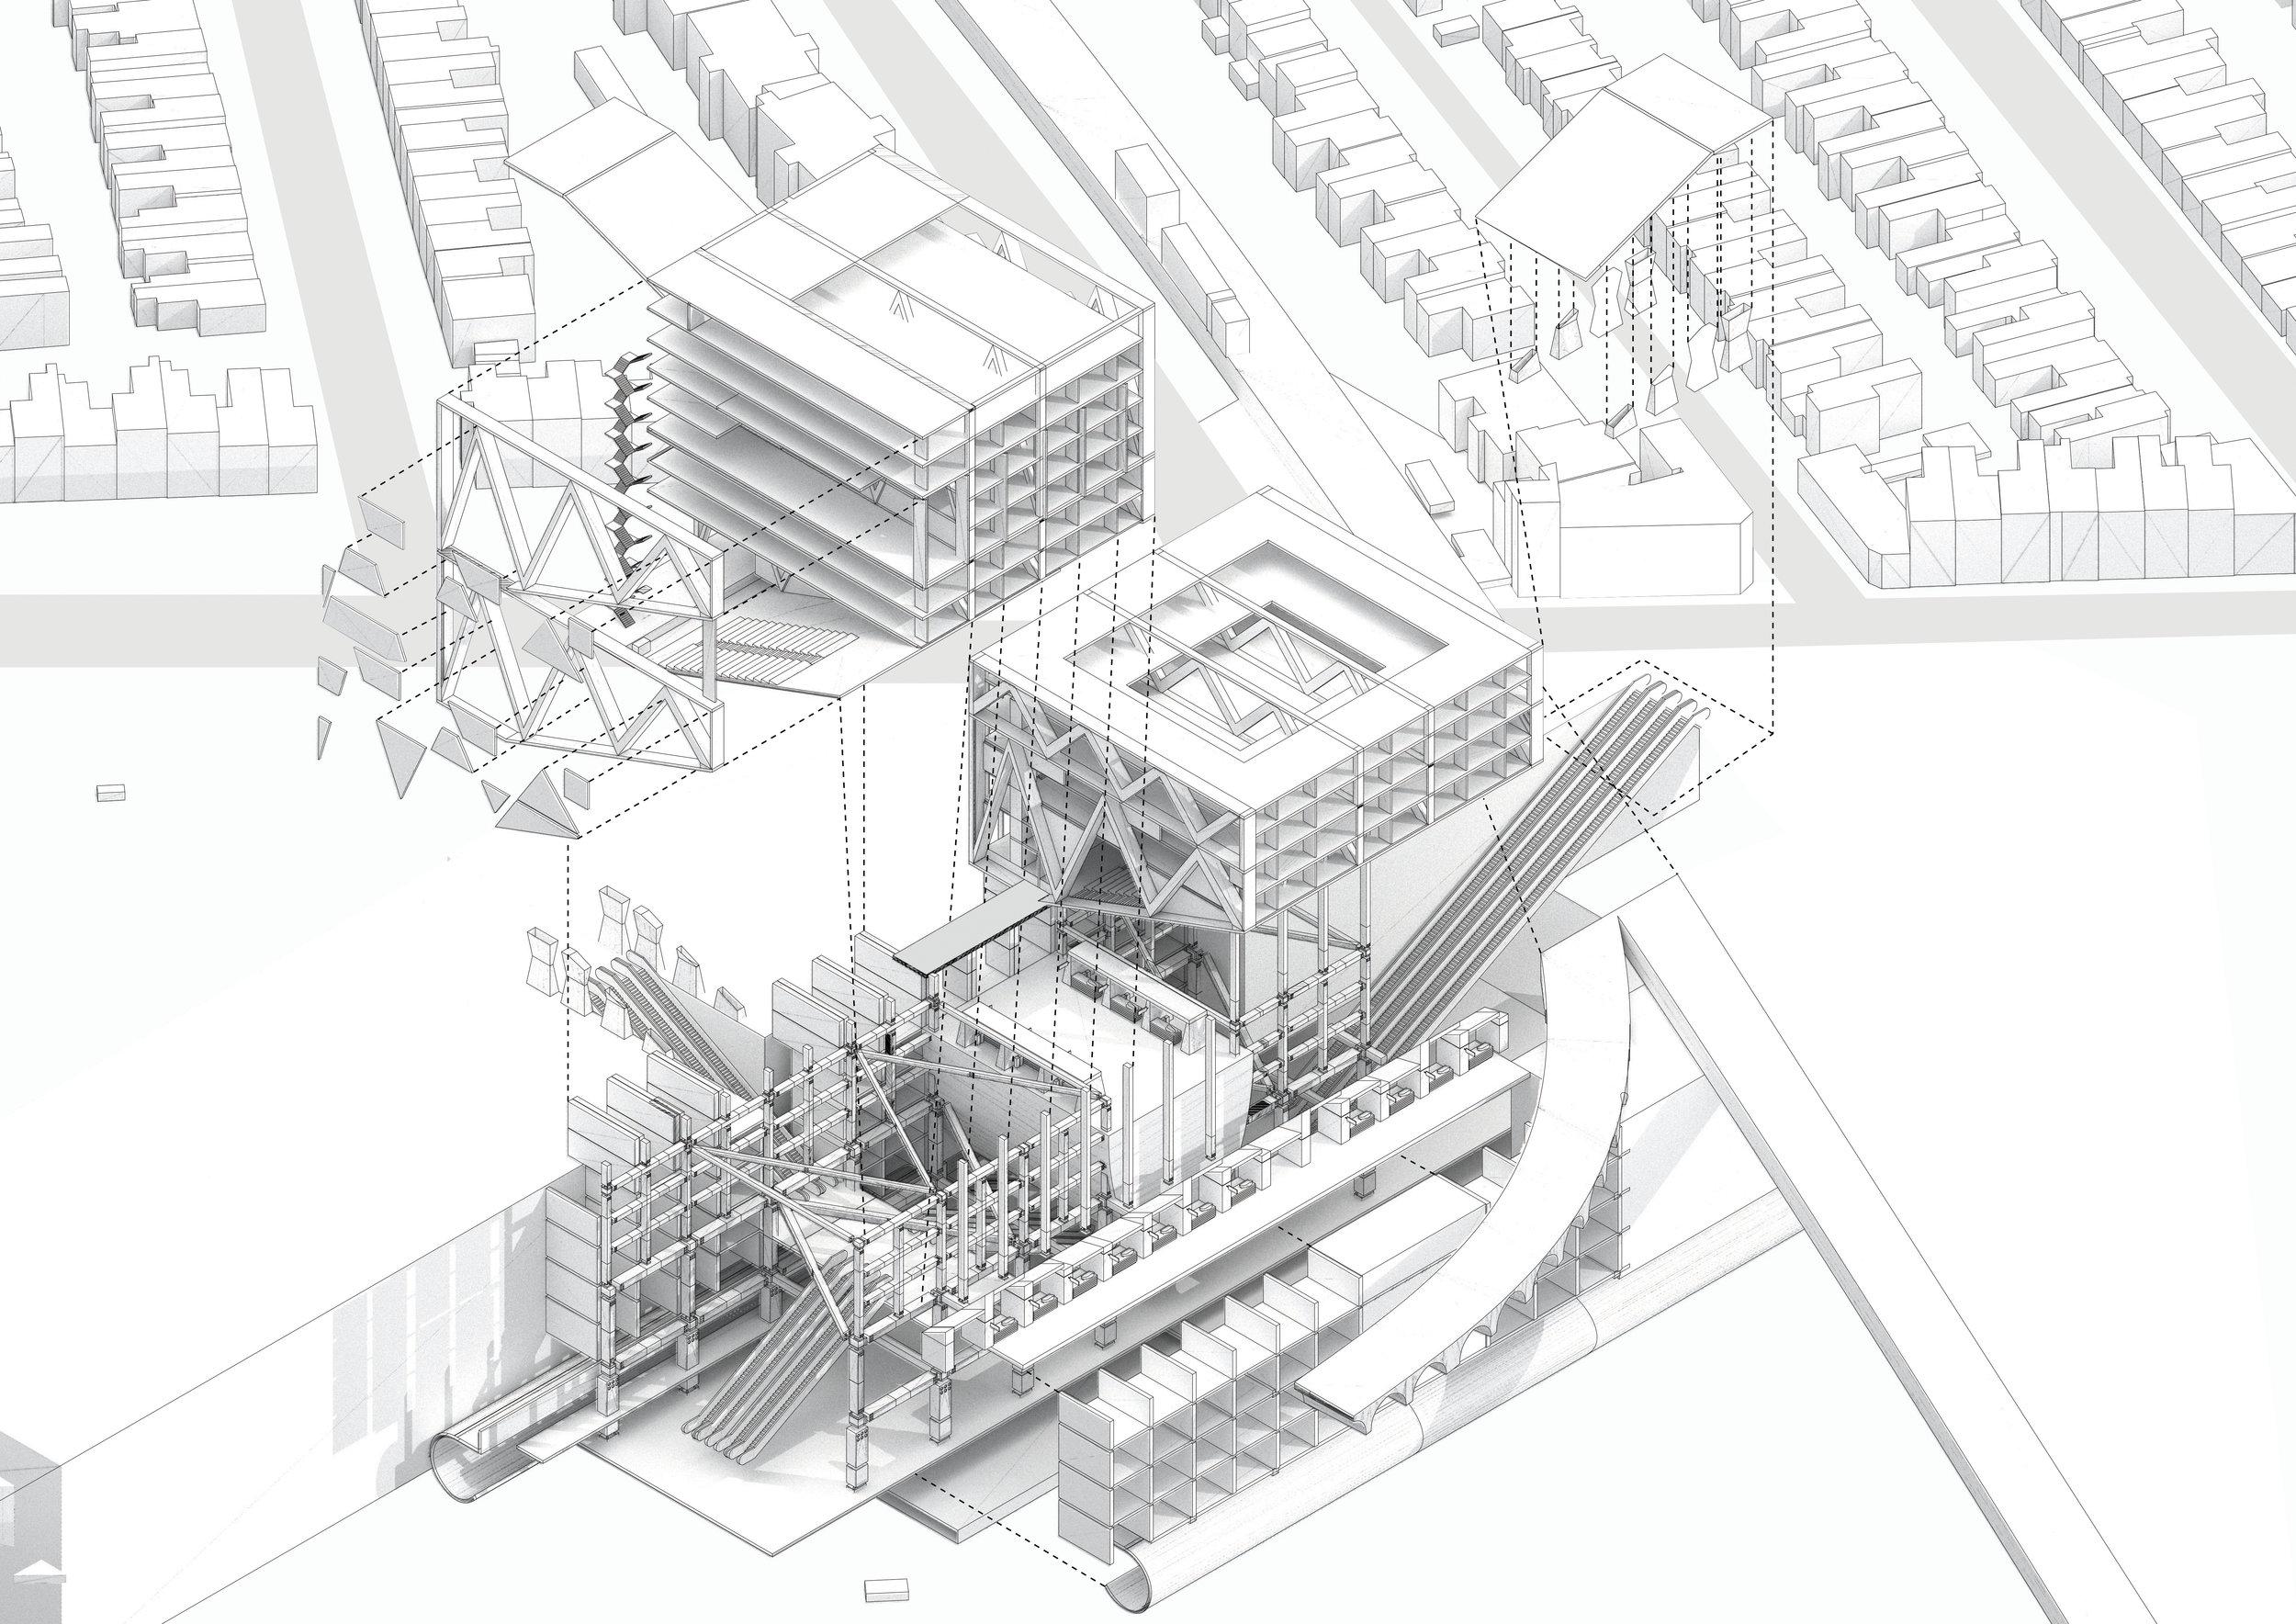 Civic Station Axo